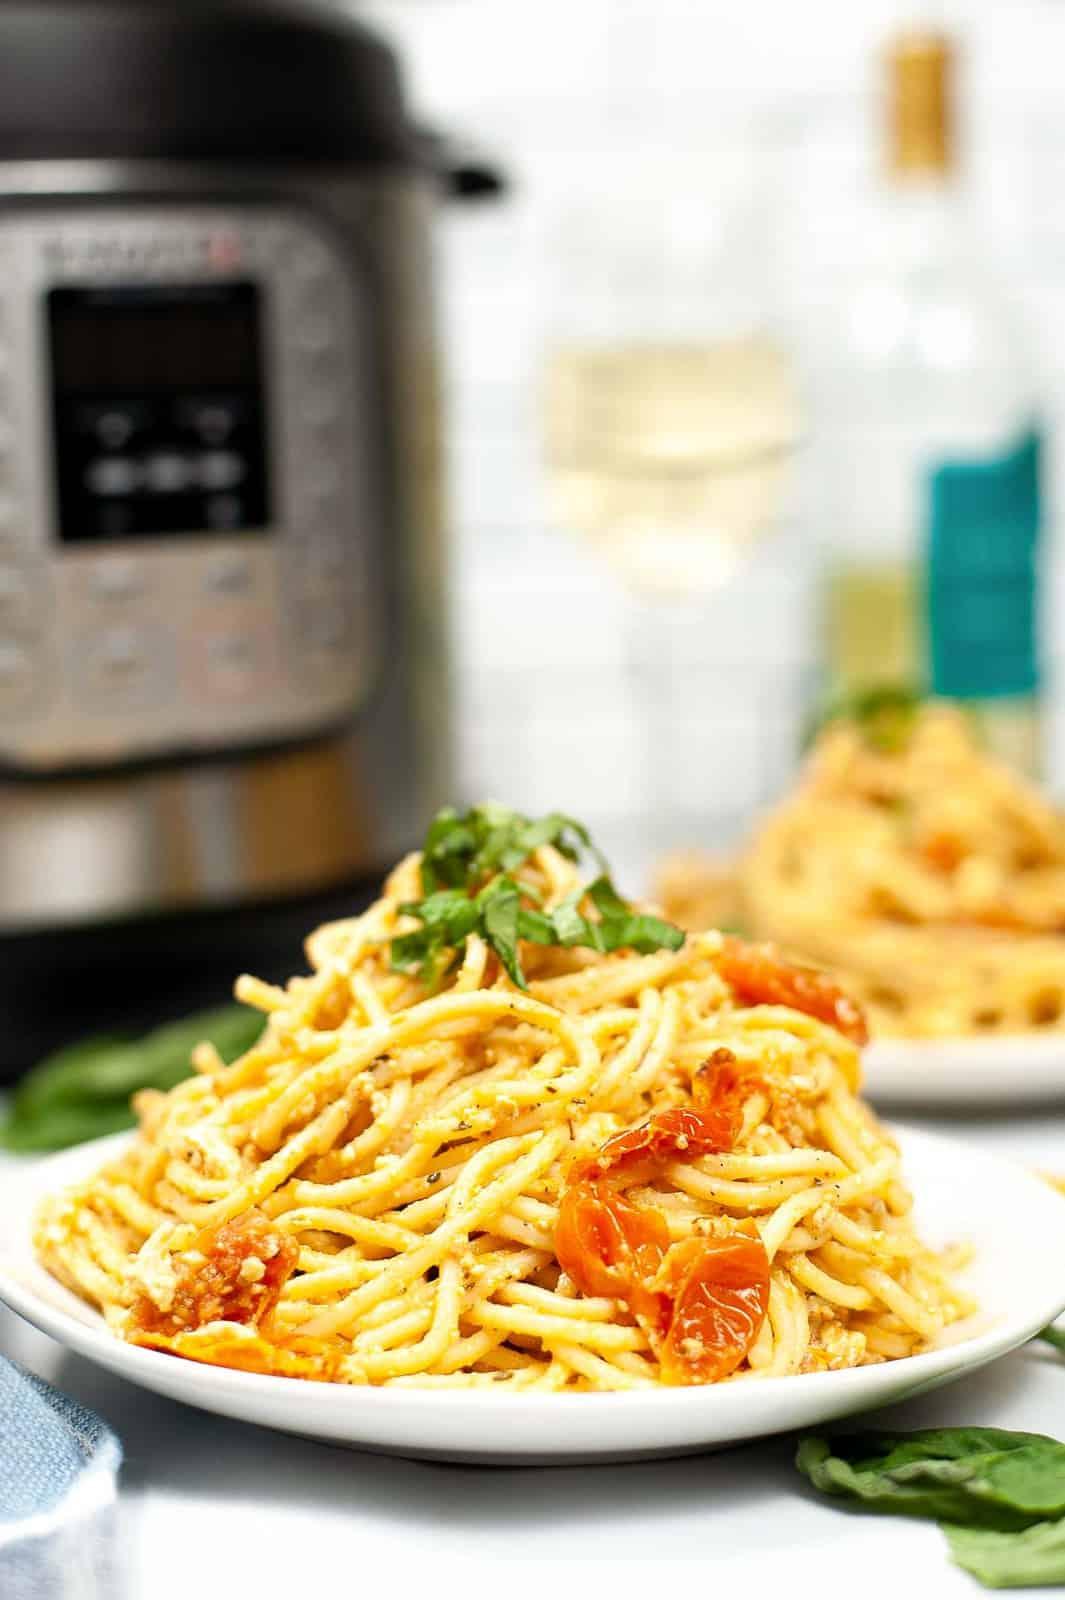 Plate of vegan tik tok pasta in front of an Instant Pot.